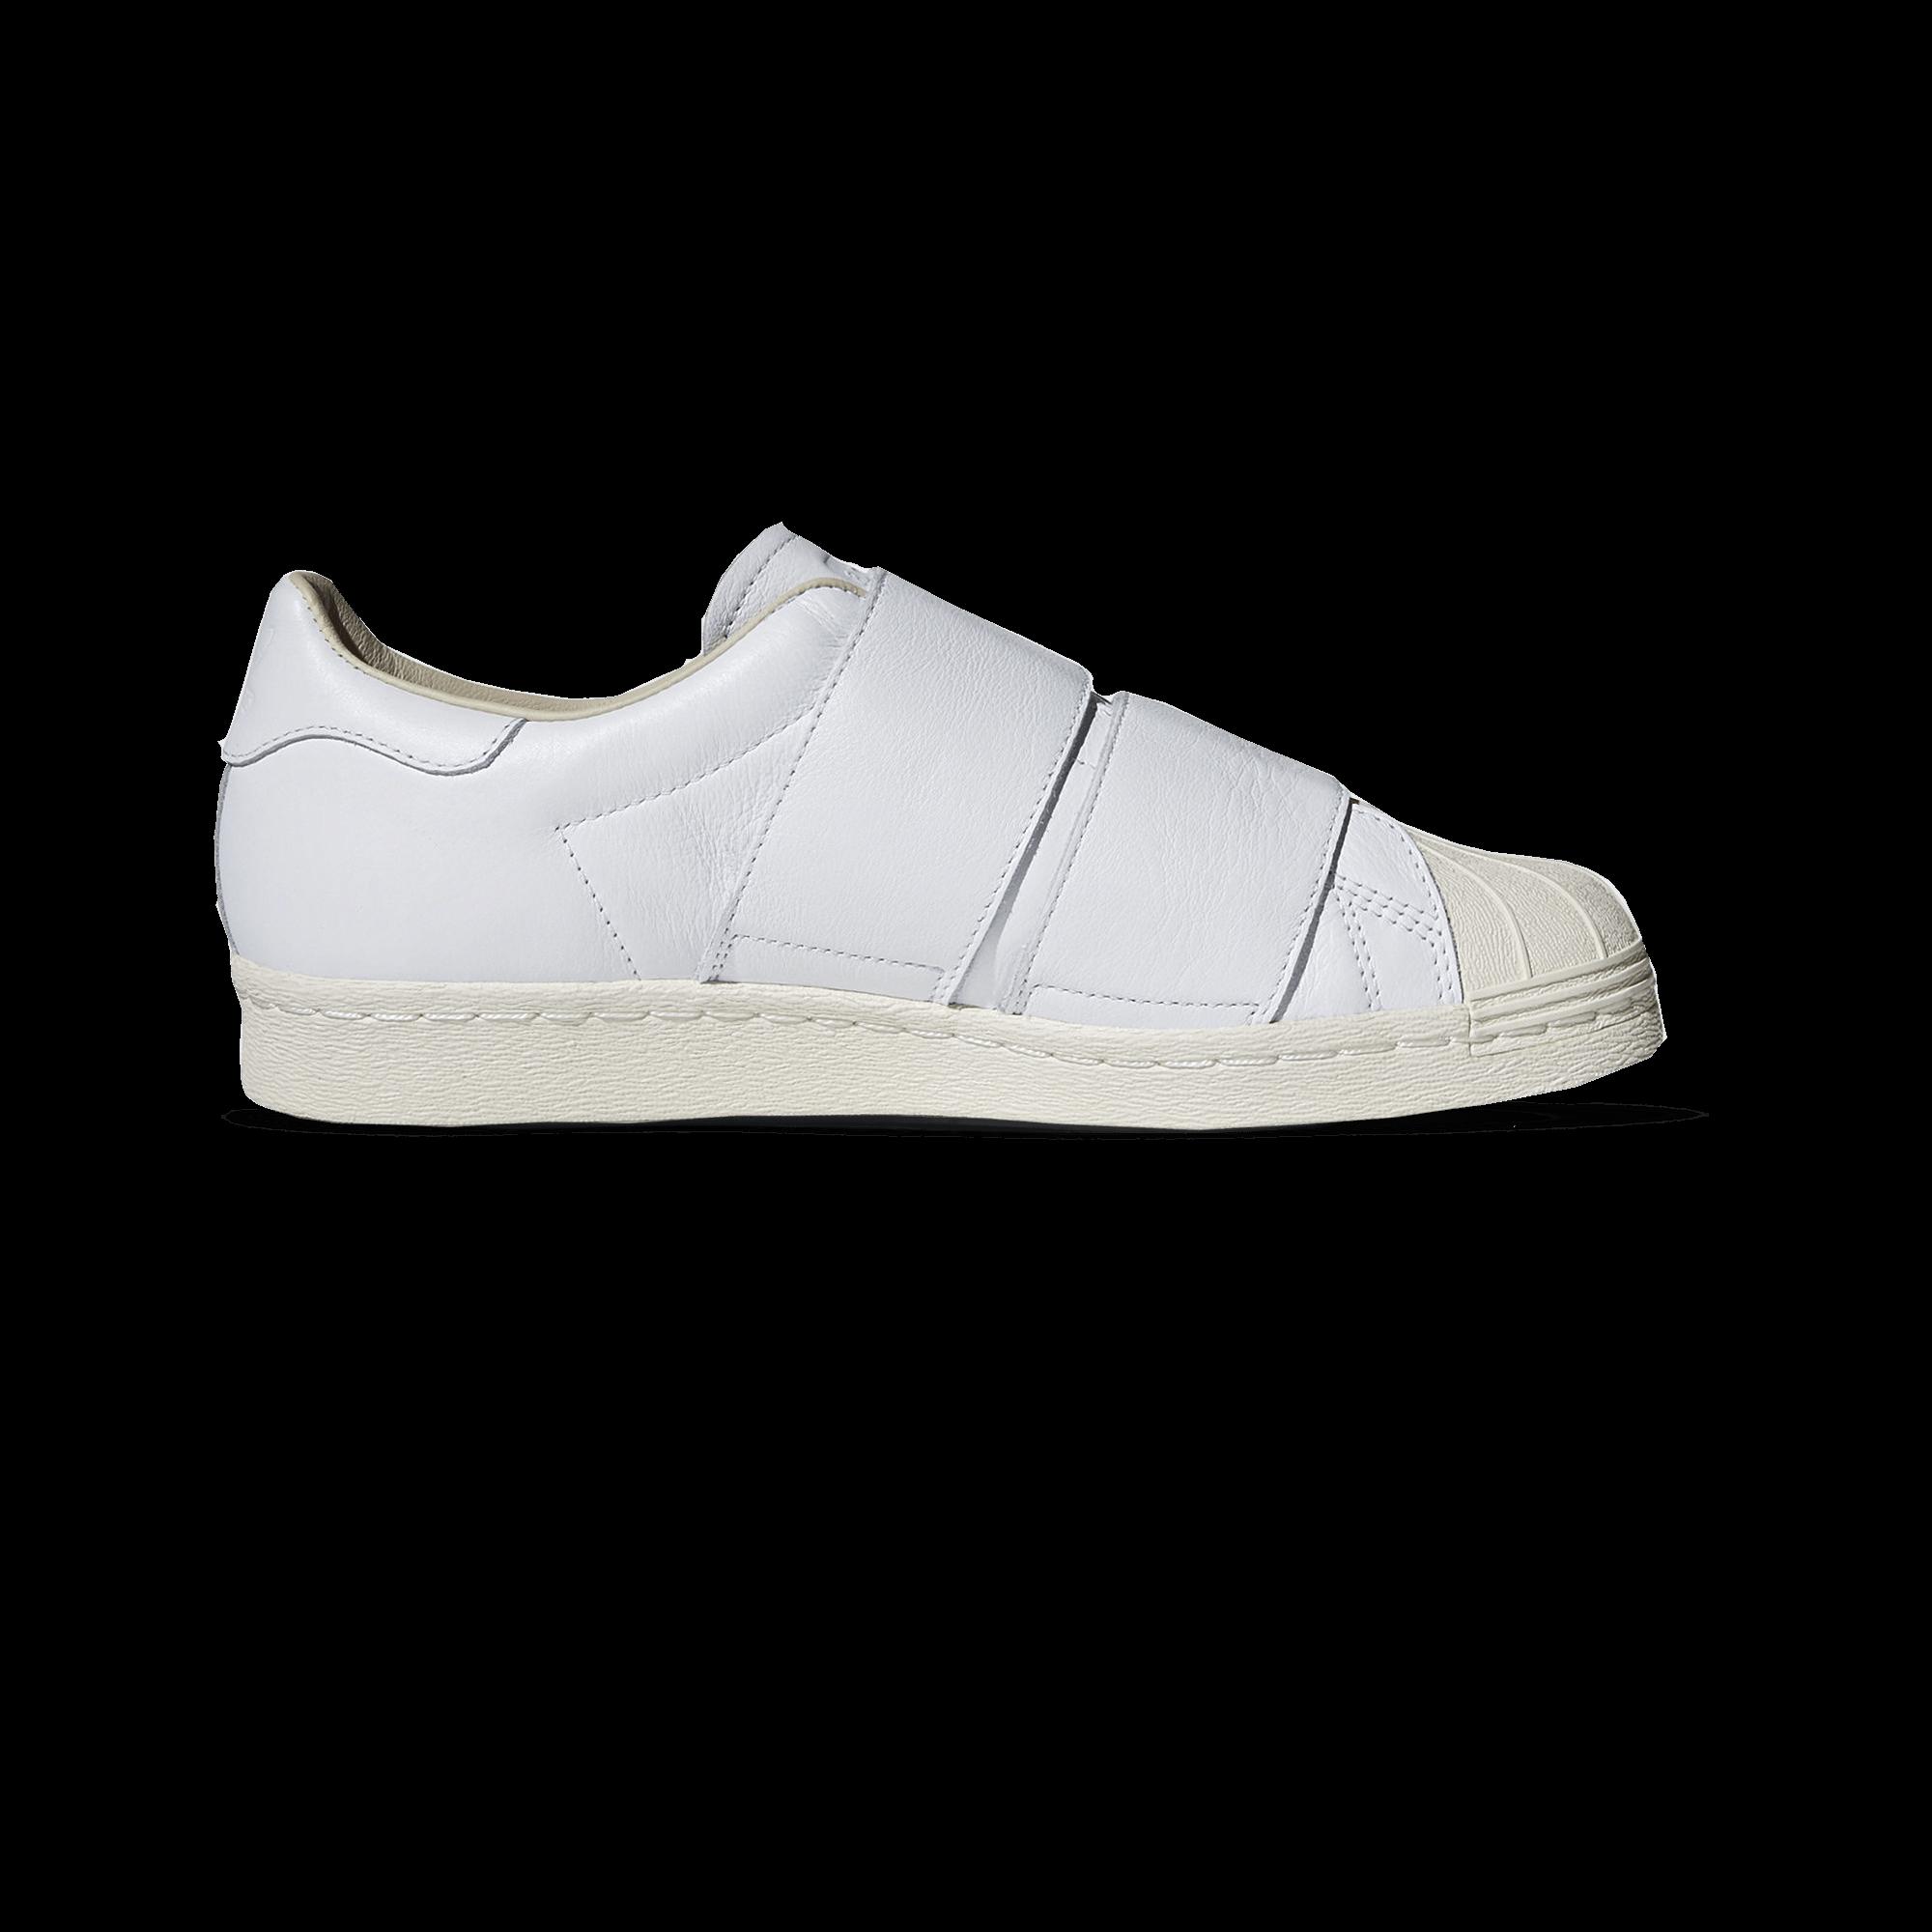 Adidas Superstar 80 CF blanco / blanco mujer